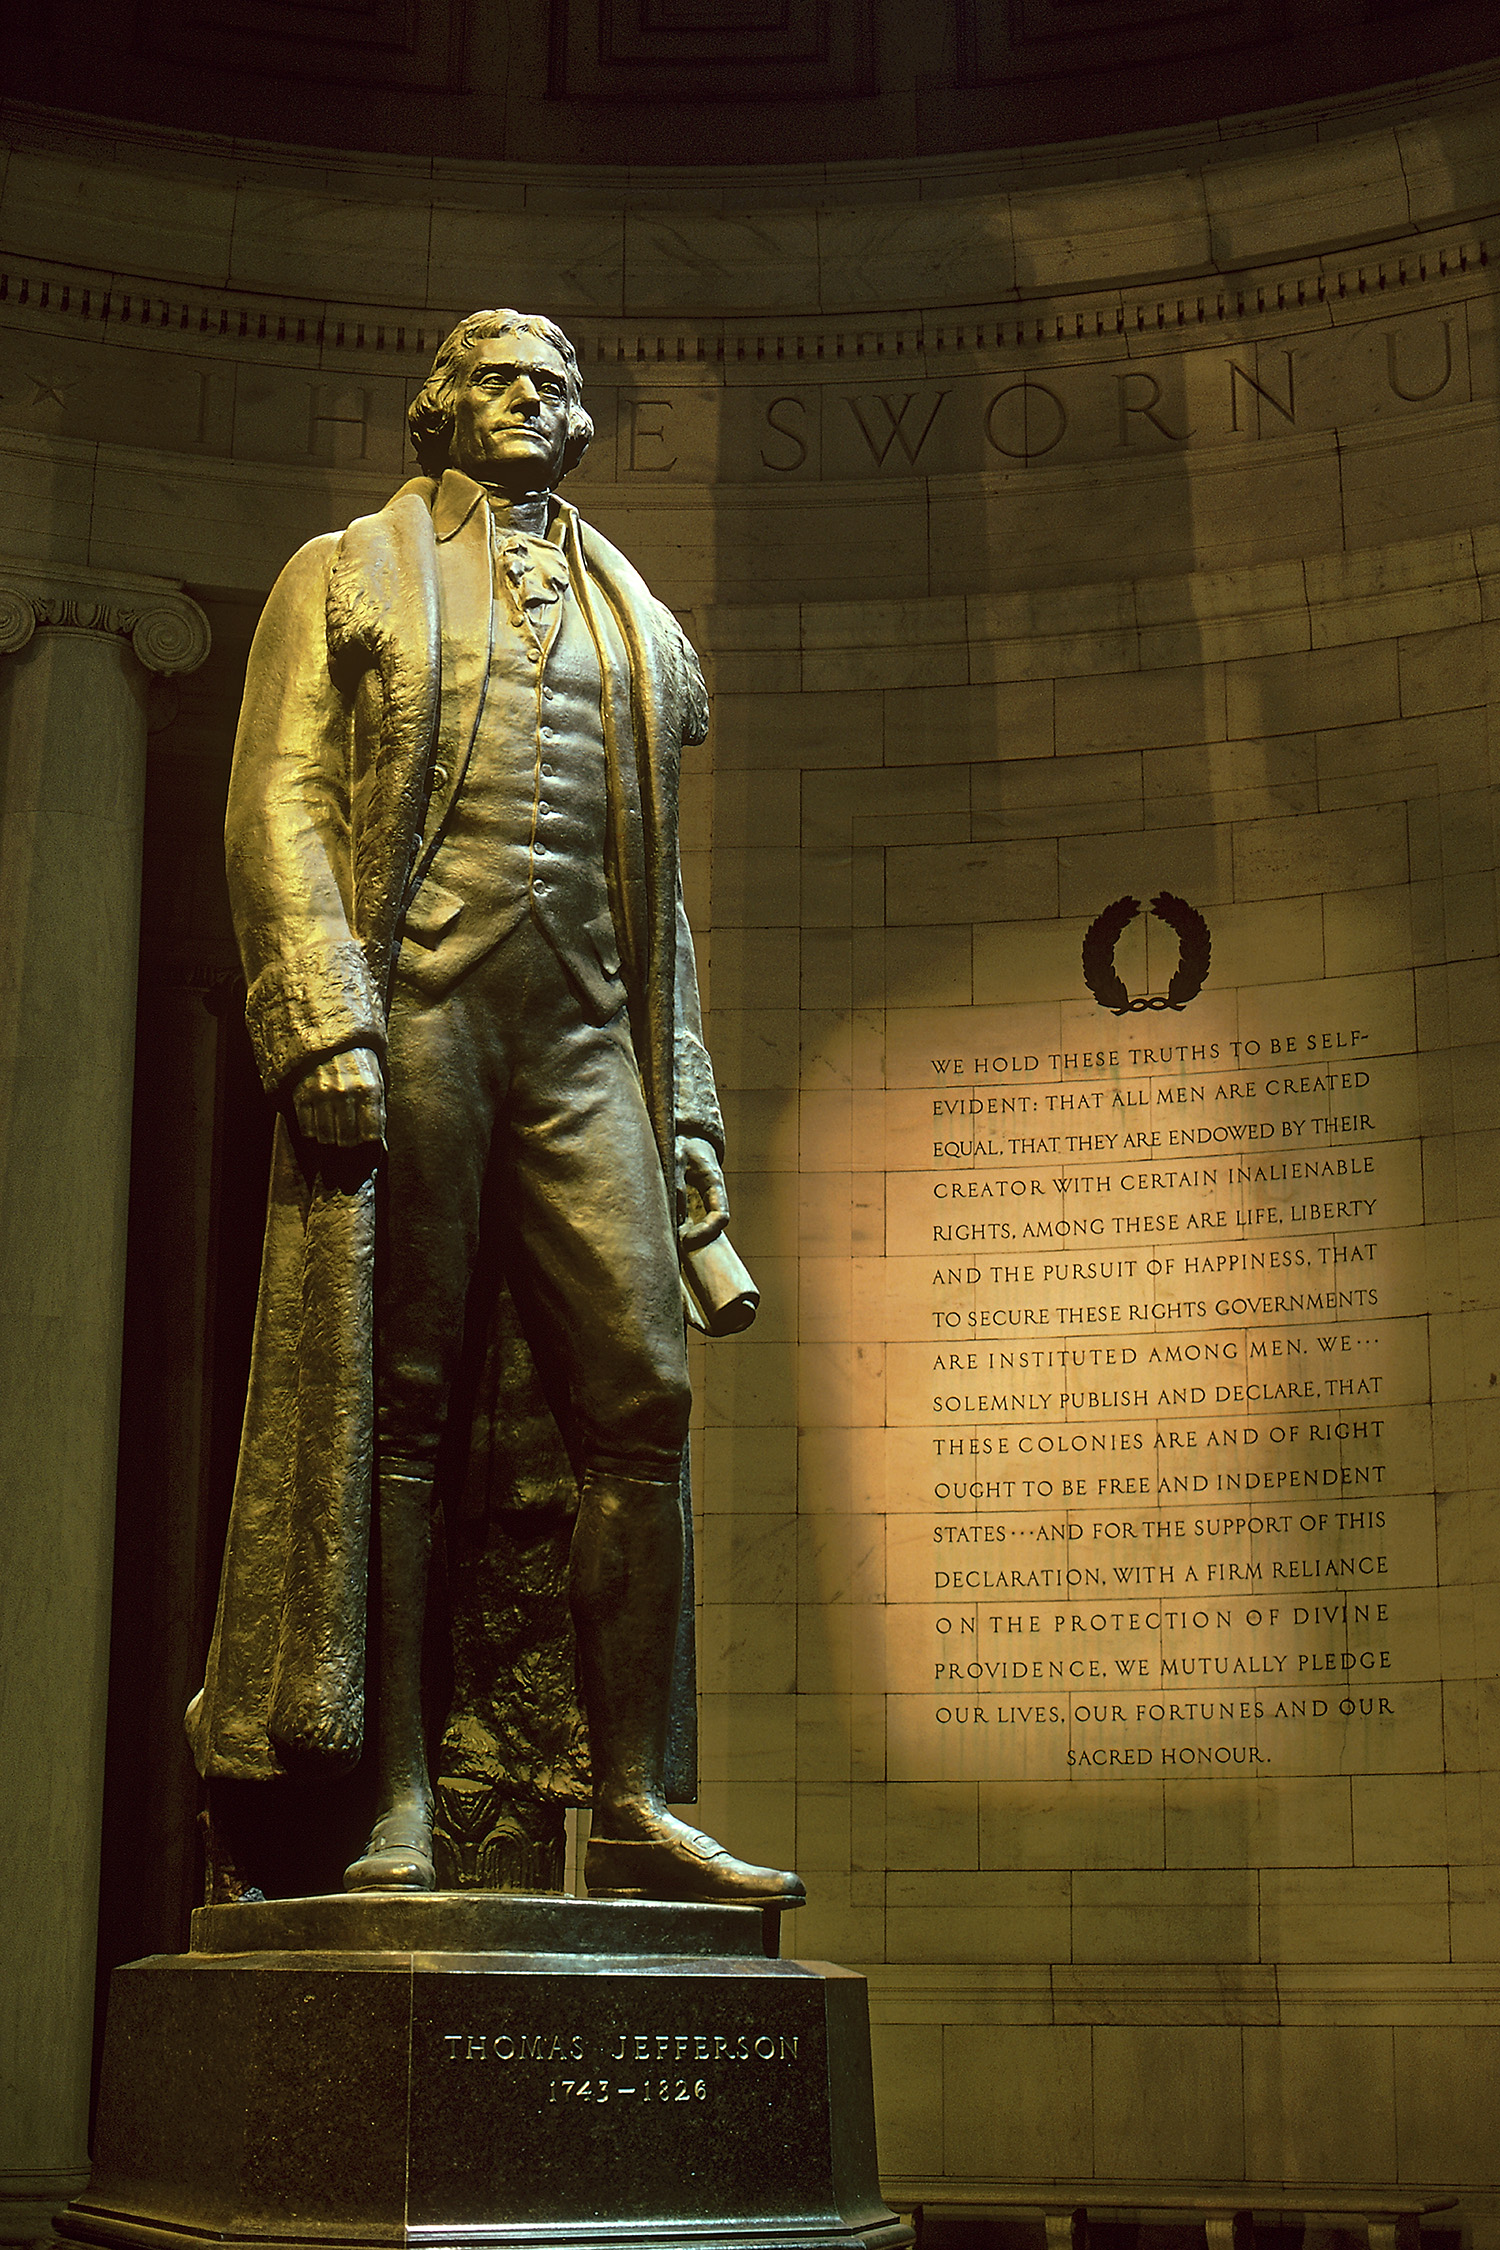 Mr. Jefferson